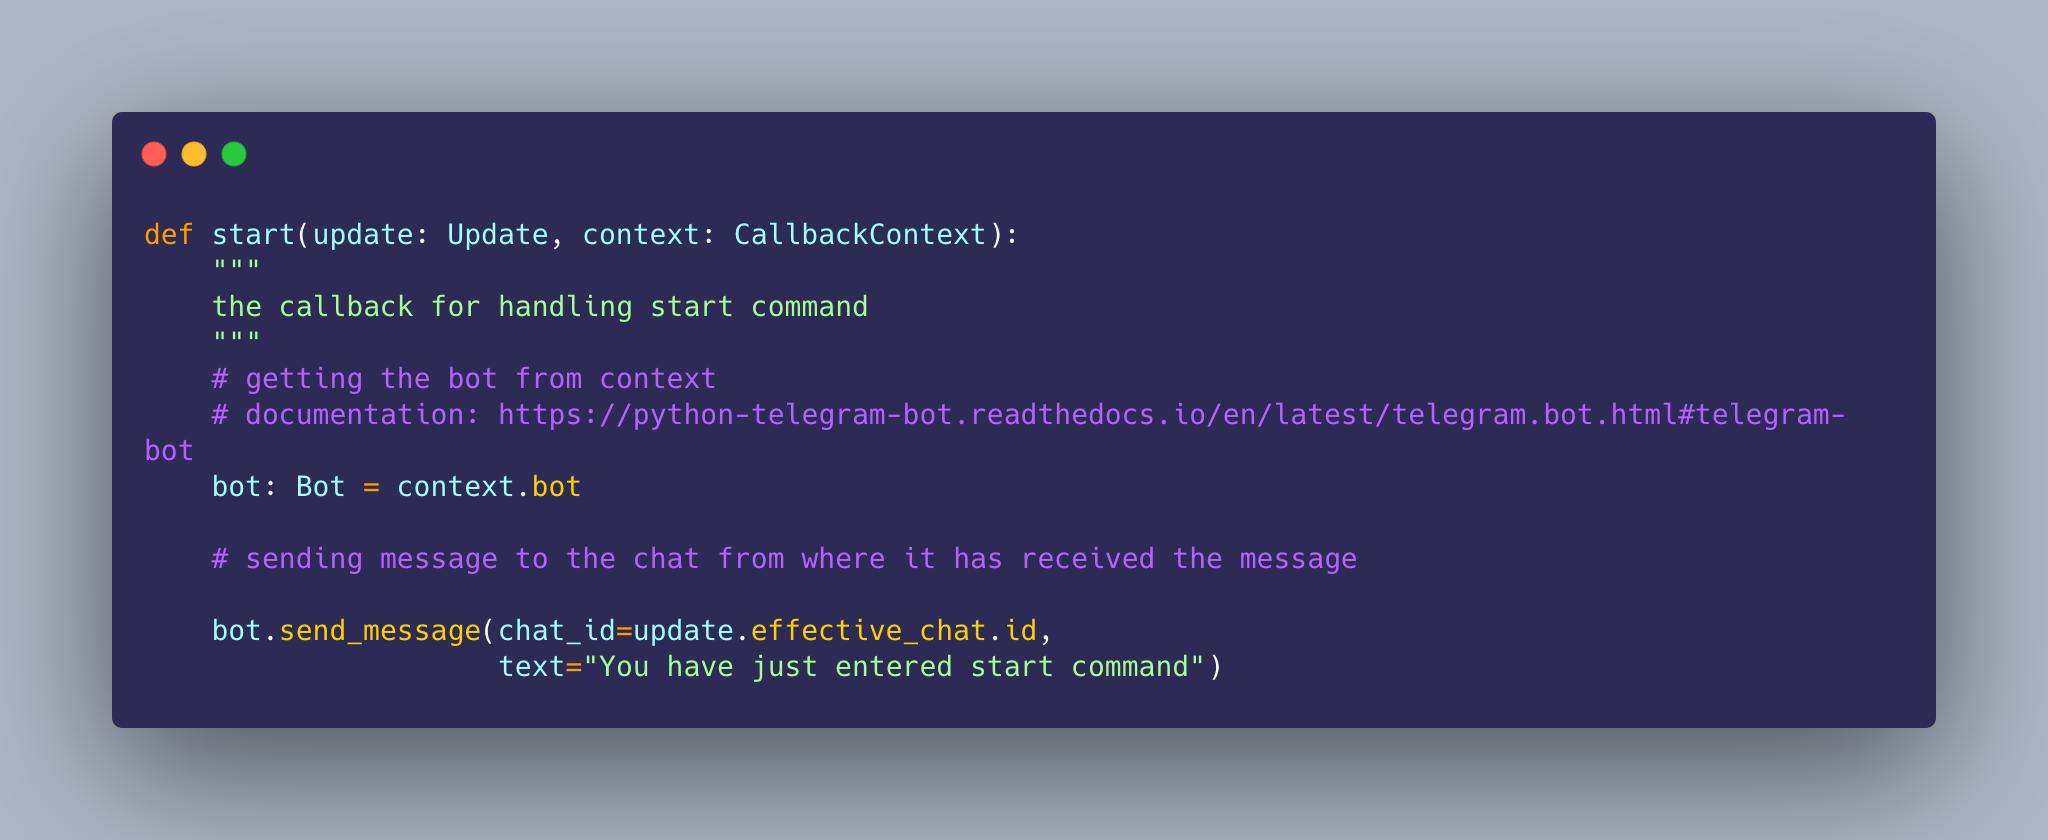 Telegram bot message sending using python